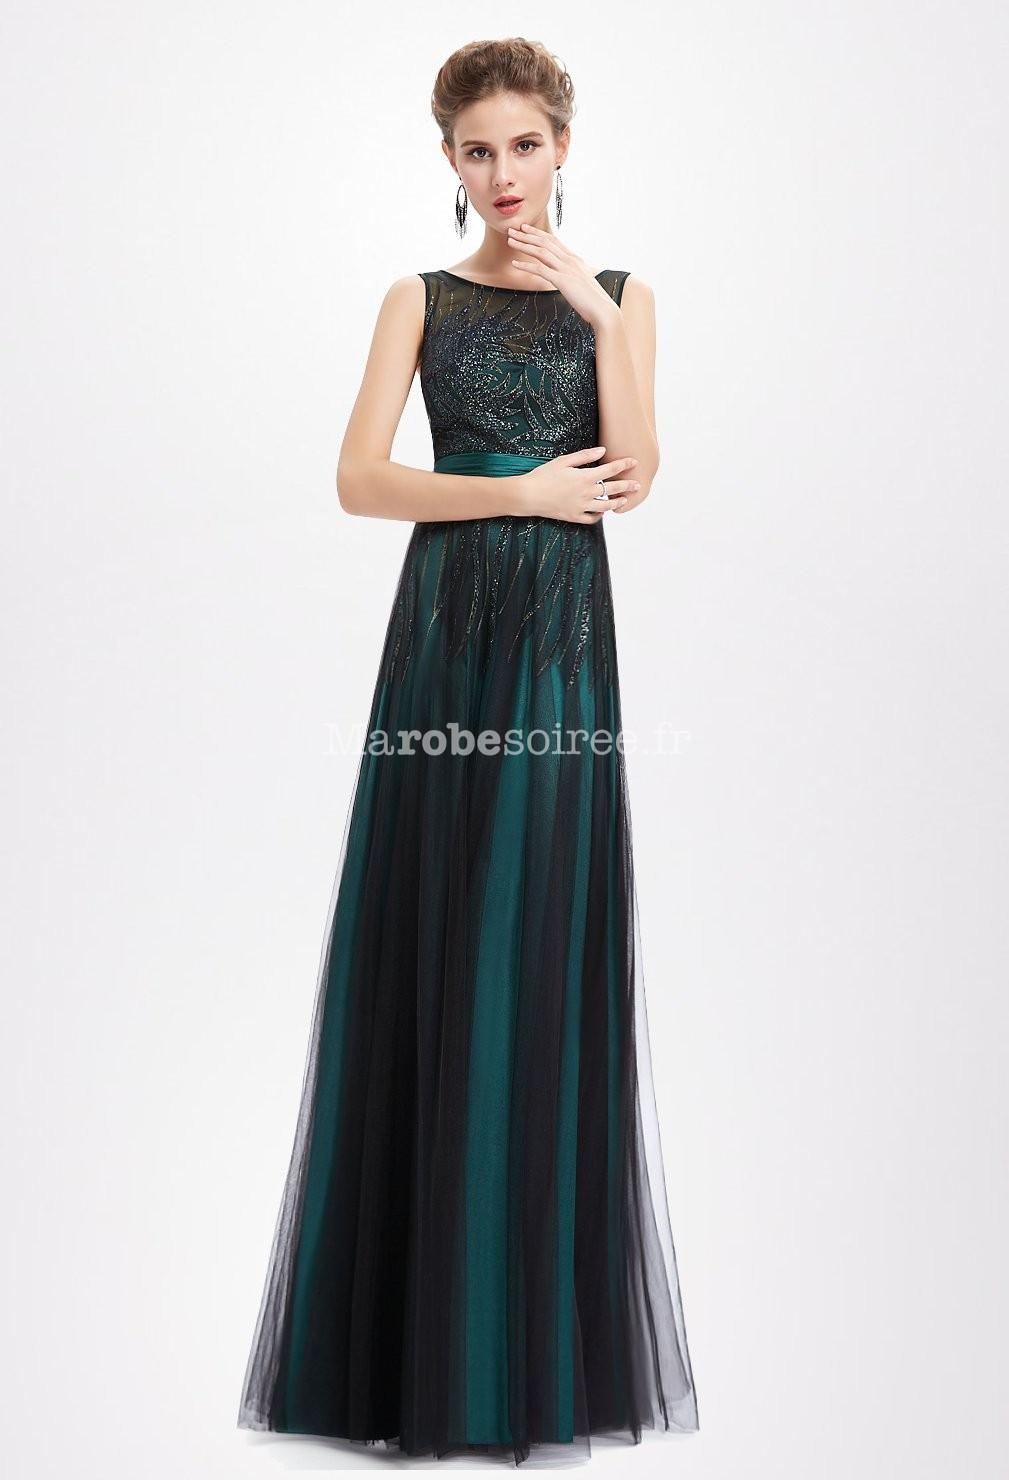 robe de soir e en vert meraude et noir. Black Bedroom Furniture Sets. Home Design Ideas